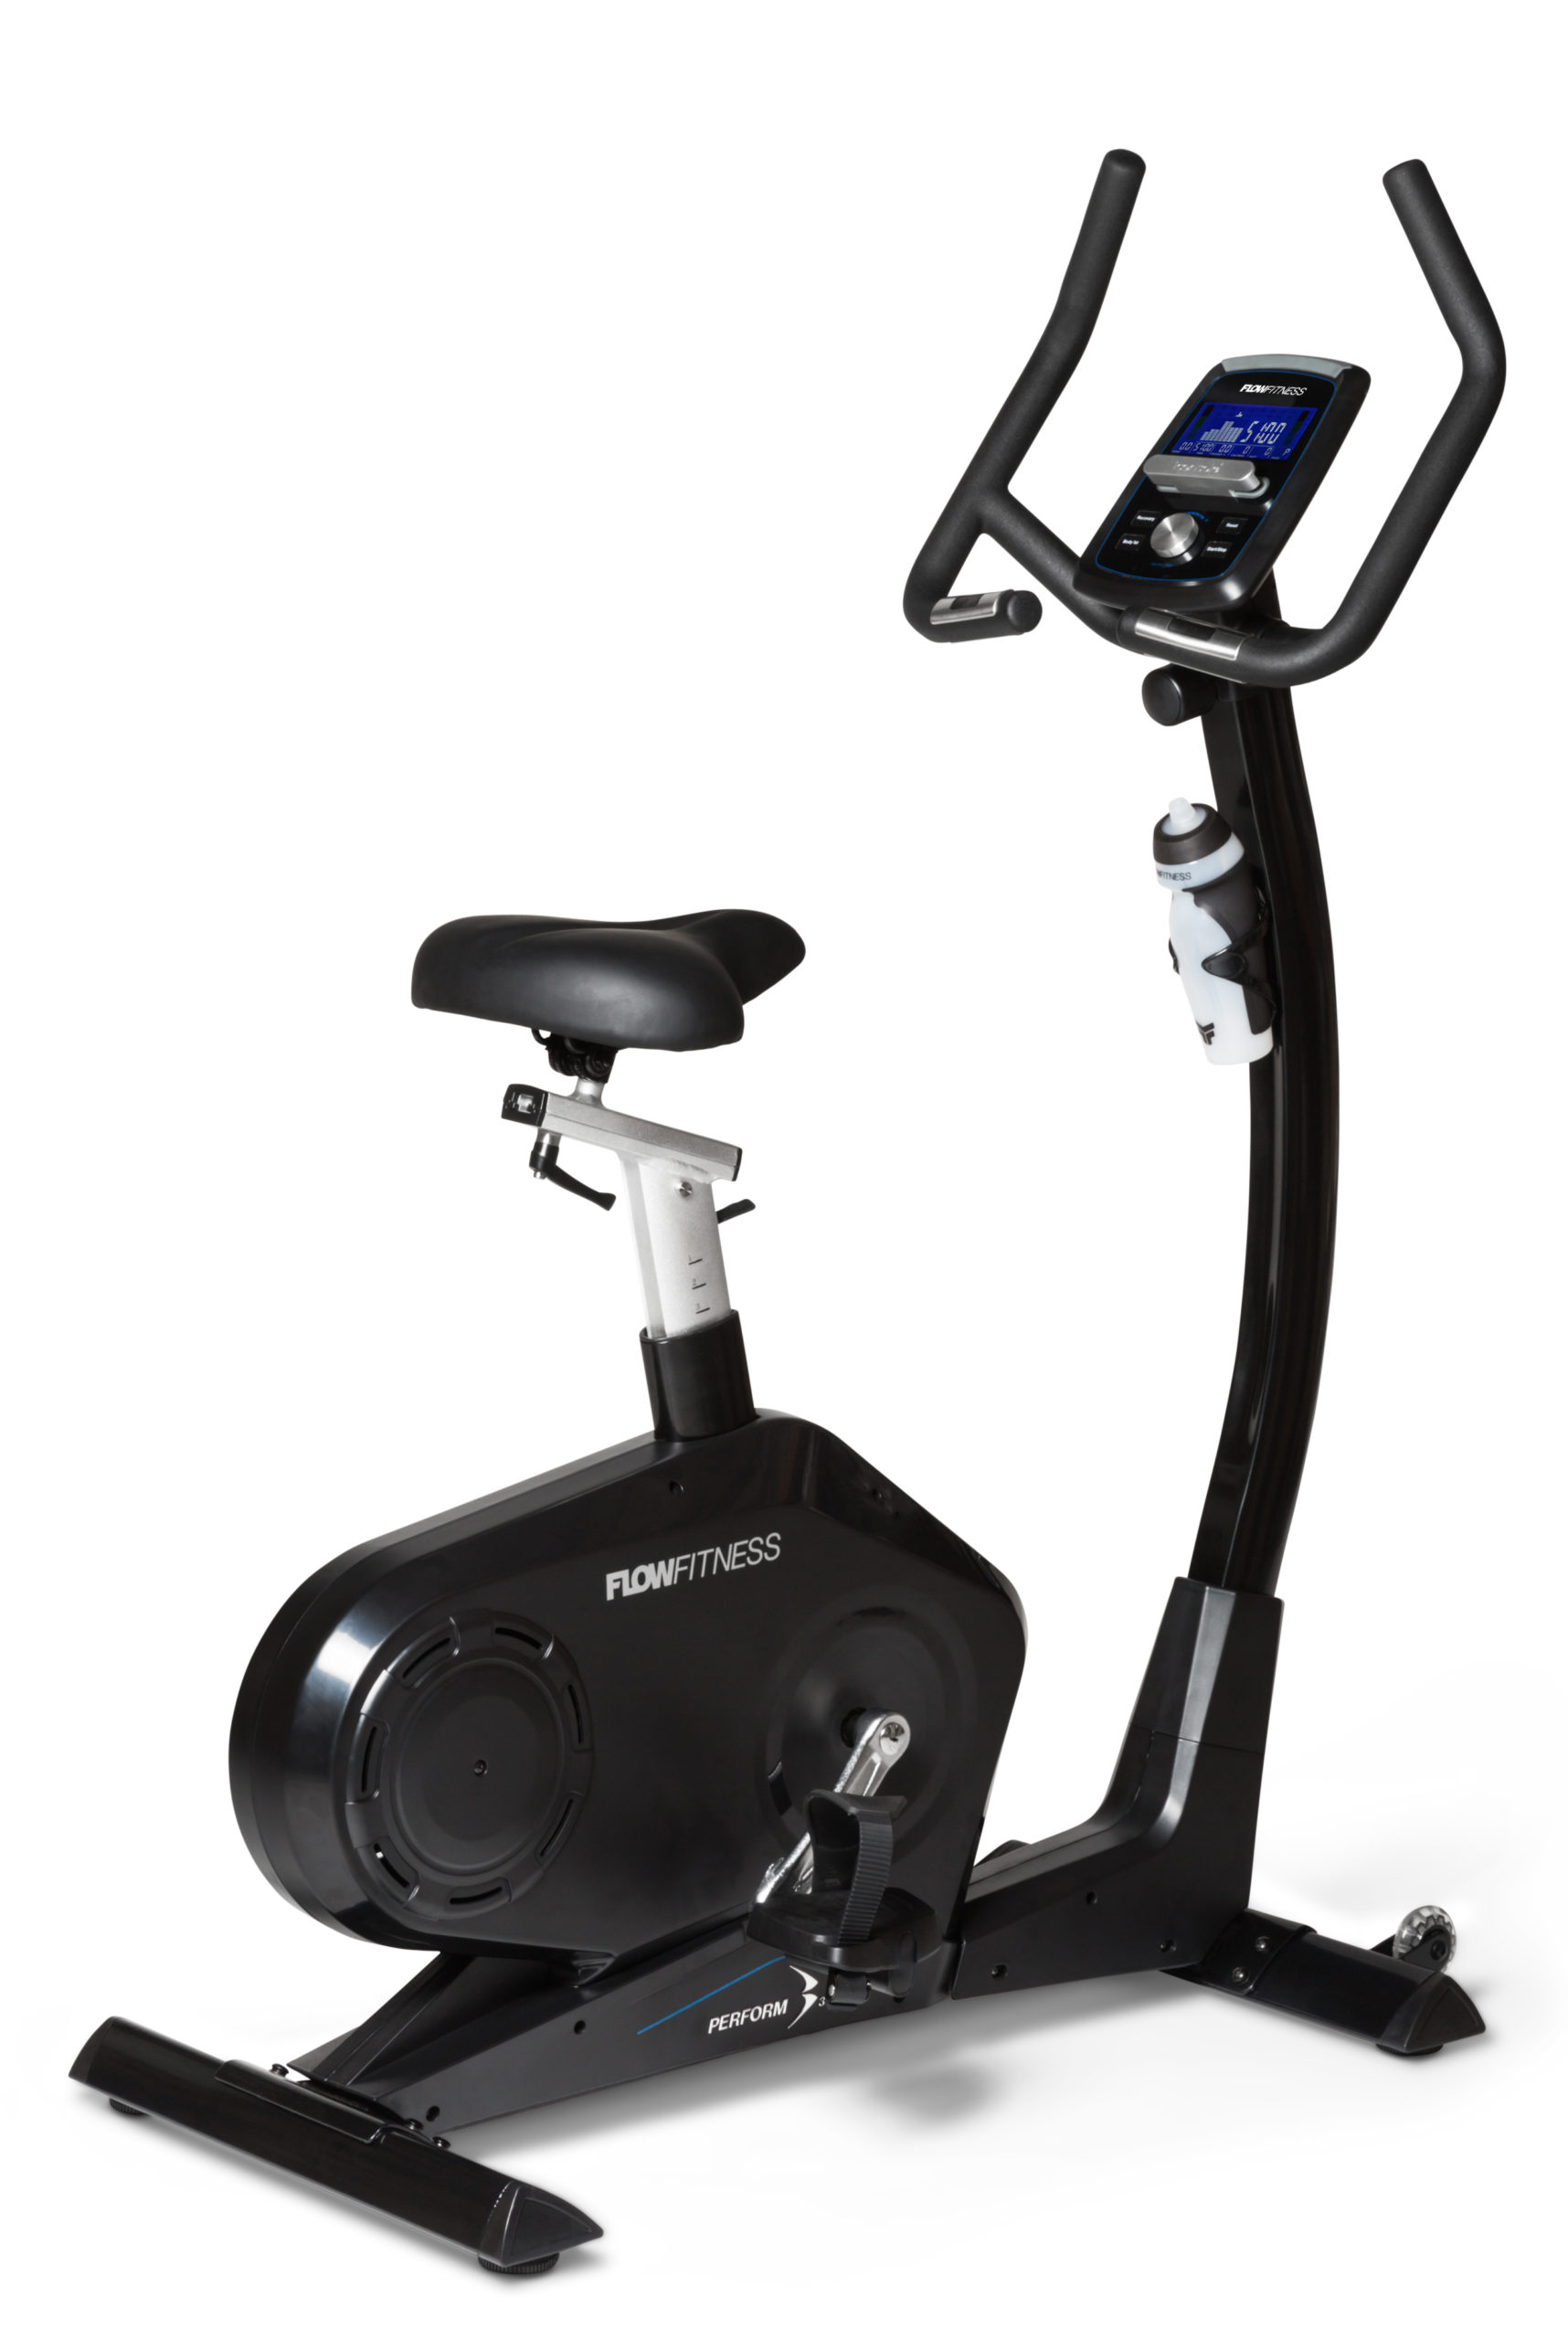 Flow Fitness Tabel PERFORM B3i Ergometer 20